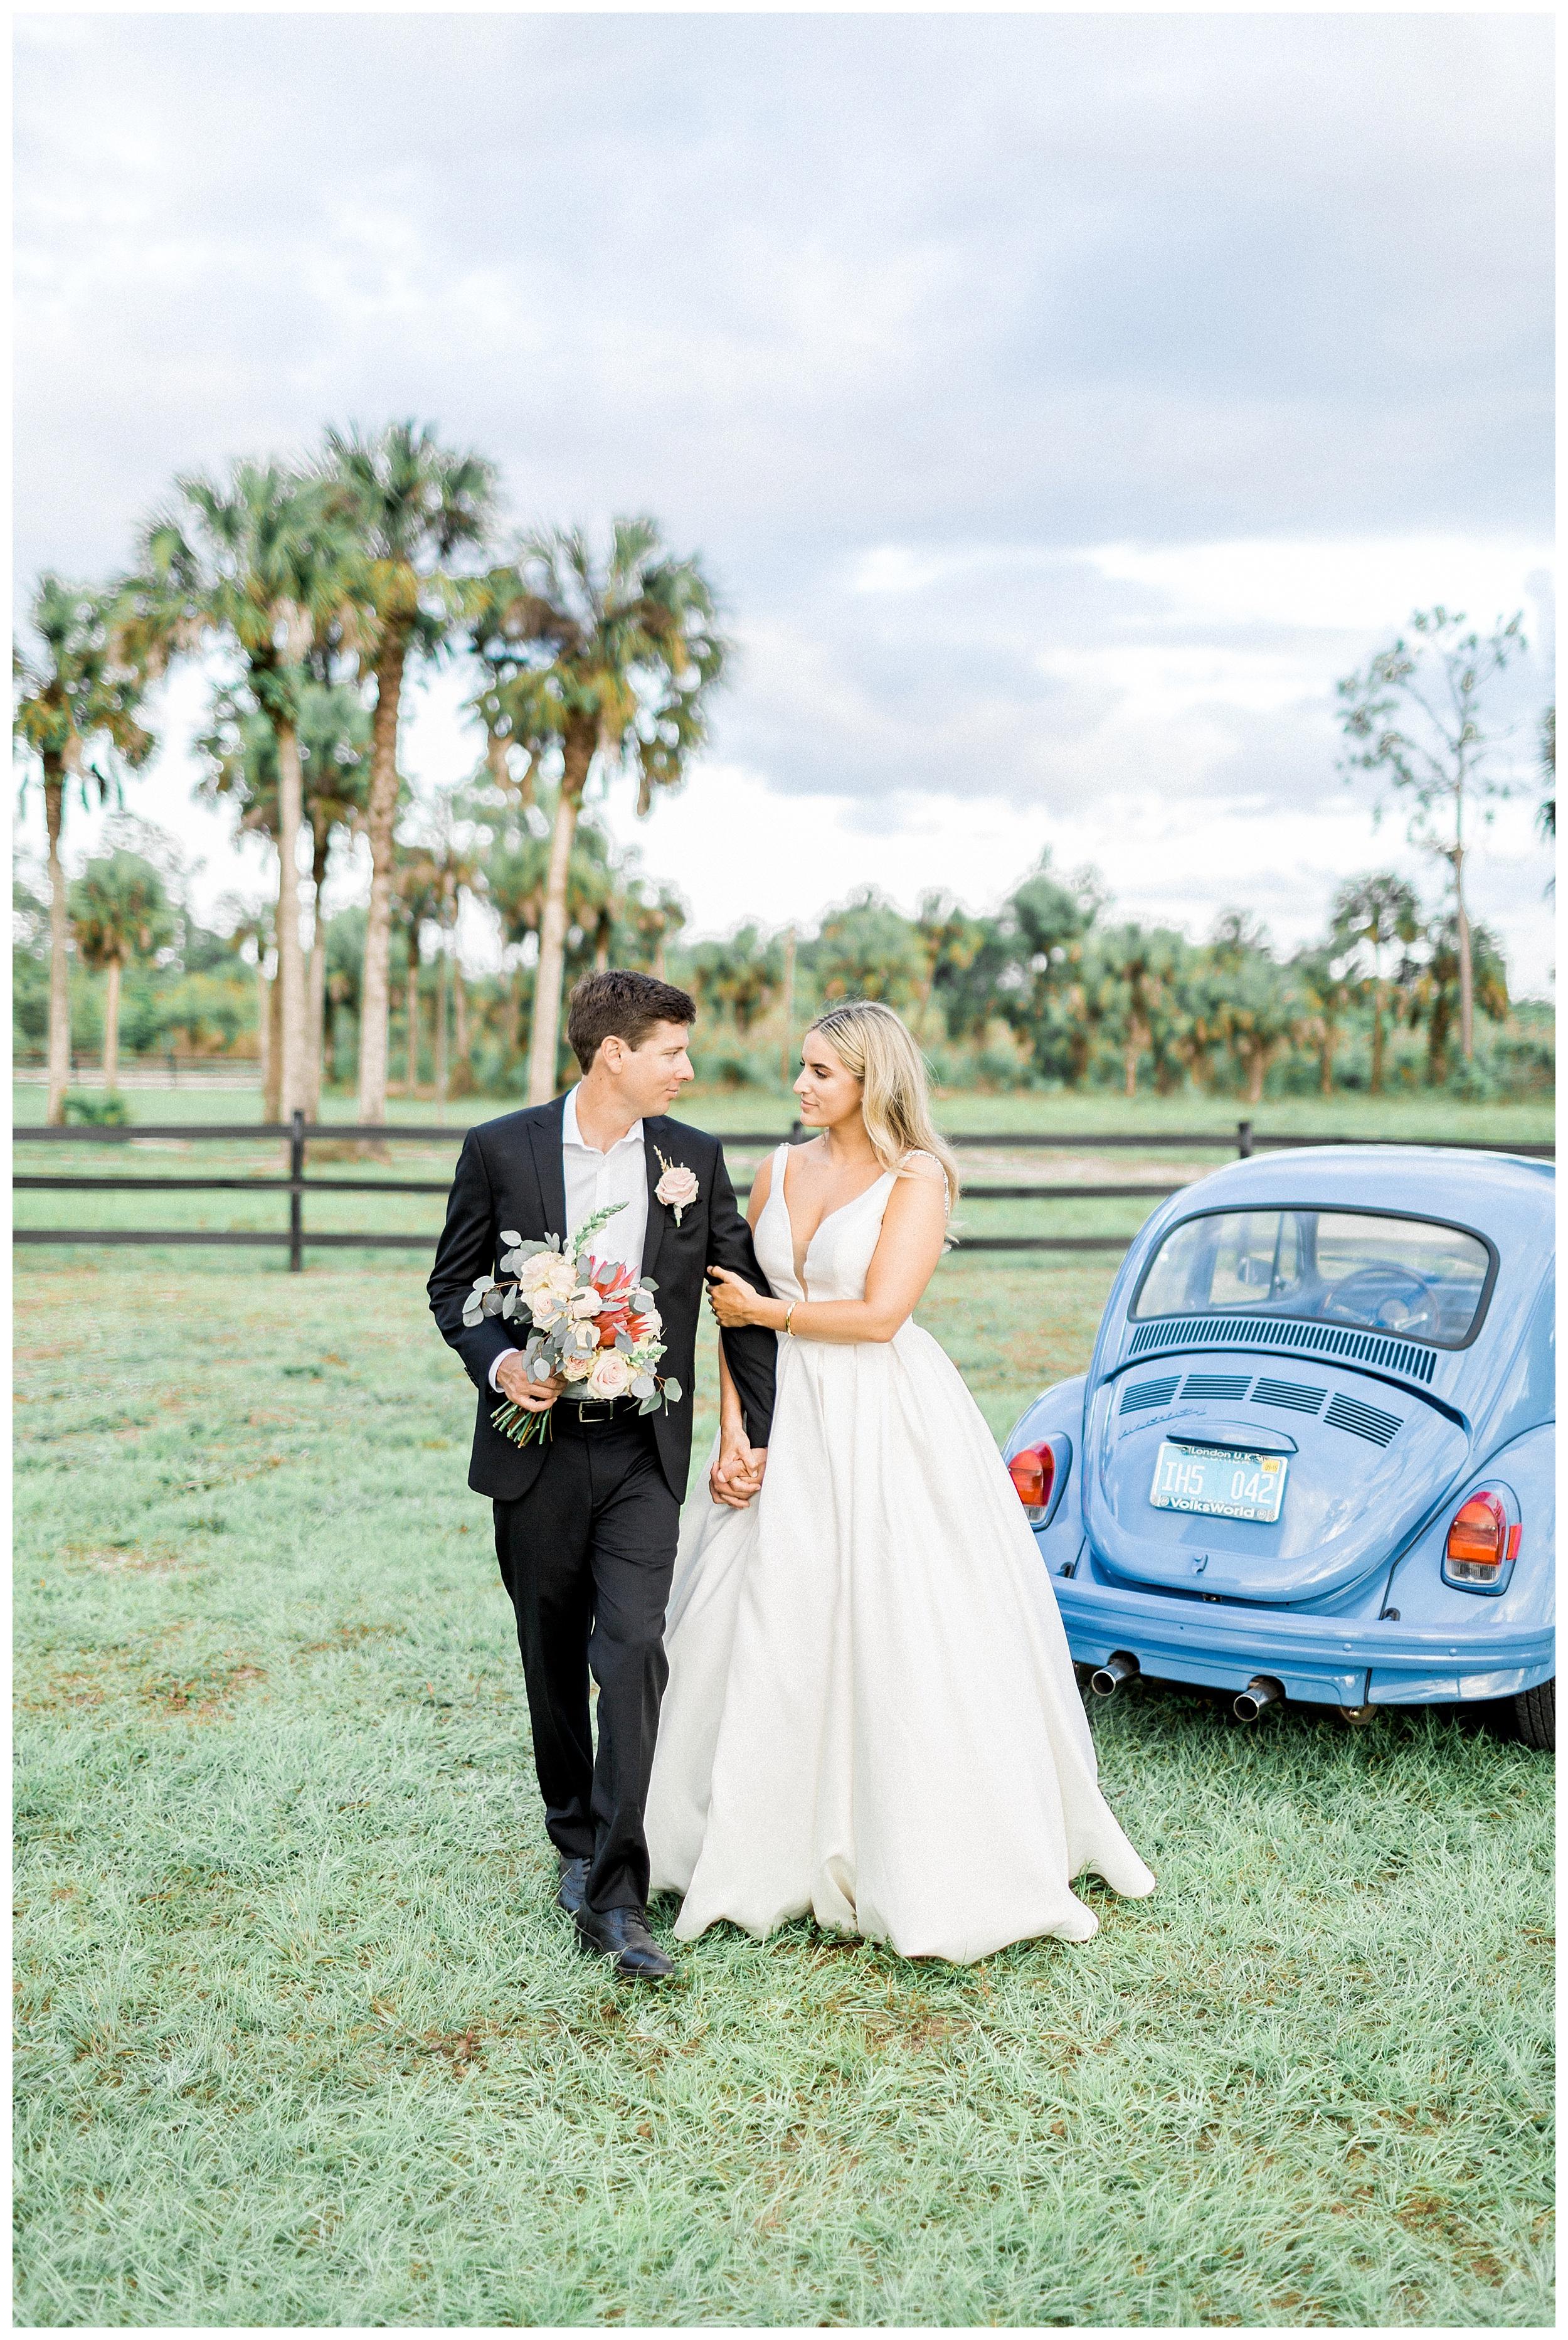 South Florida Wedding Photographer Kir Tuben_0092.jpg